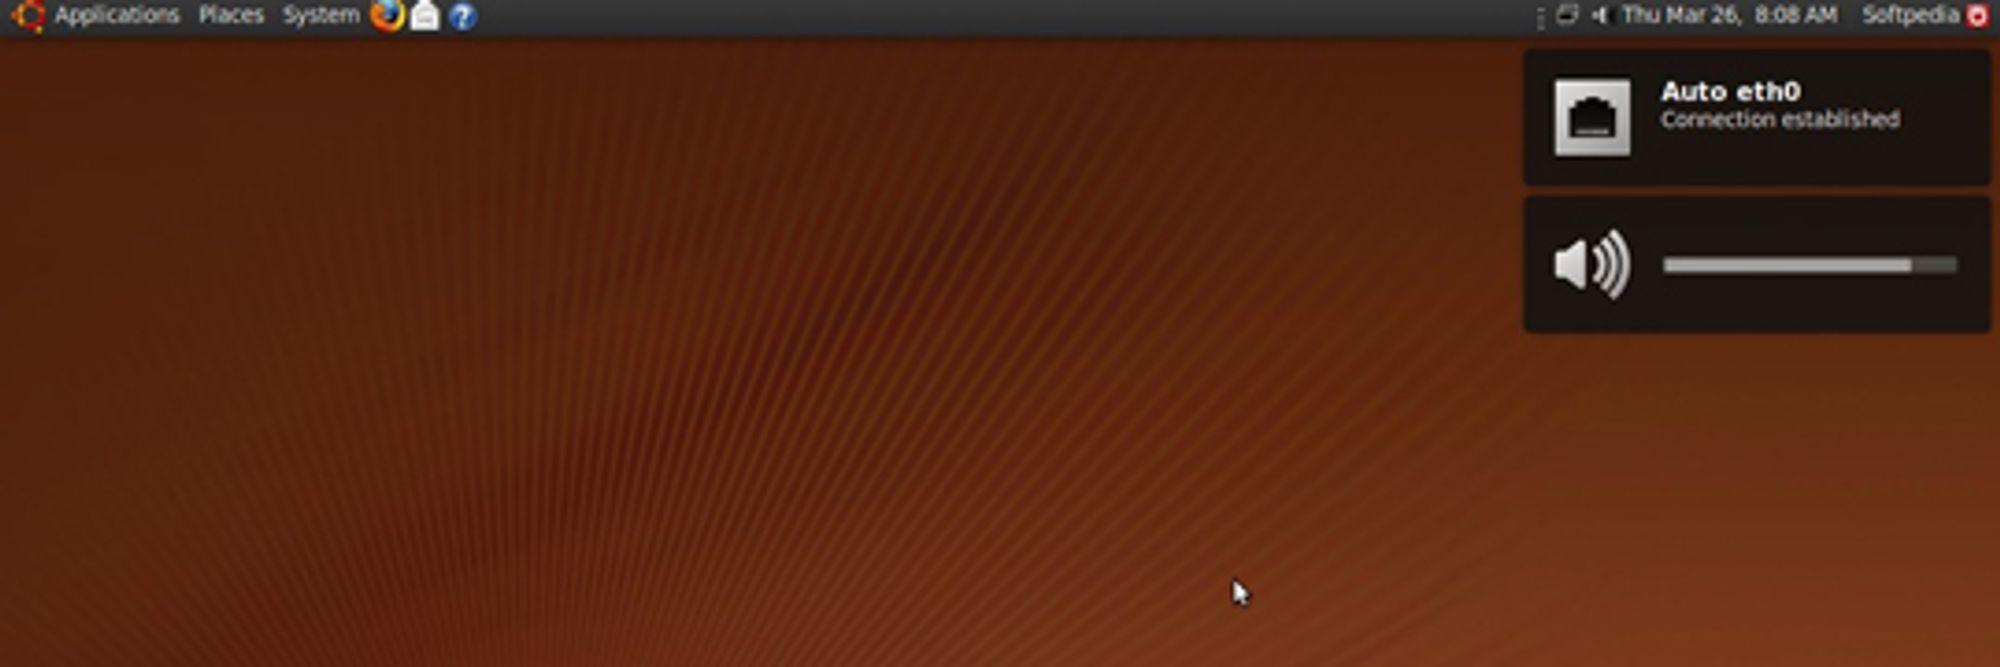 Nytt utseende og varslingssystem i Ubuntu 9.04: Jaunty Jackalope